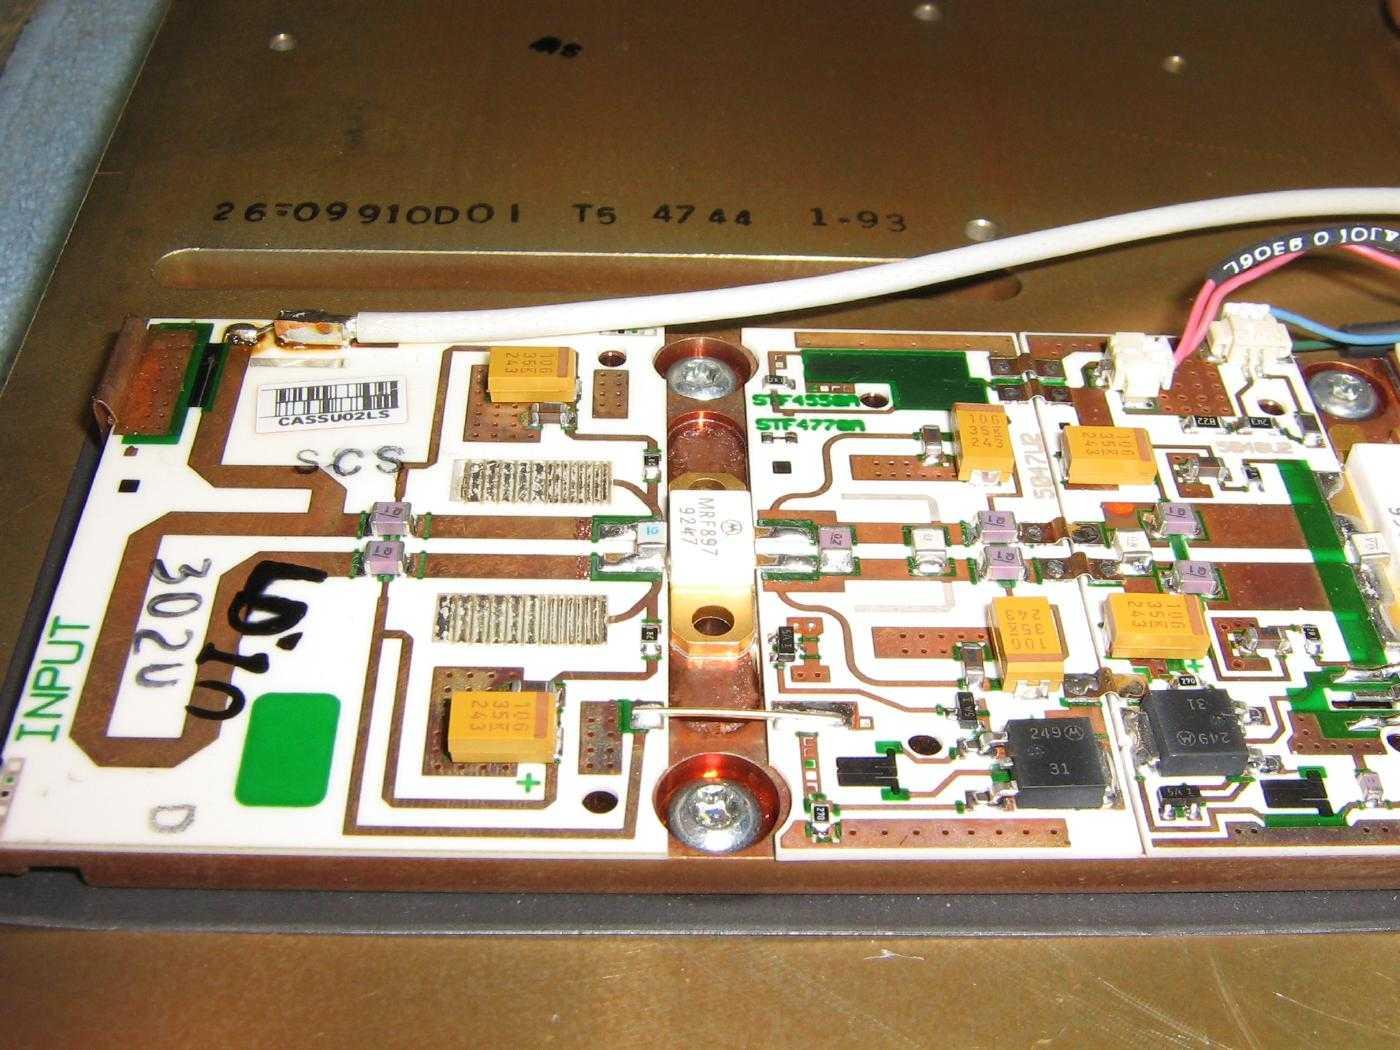 Motorola STF2520A 900 MHz Power Amplifier Modifications